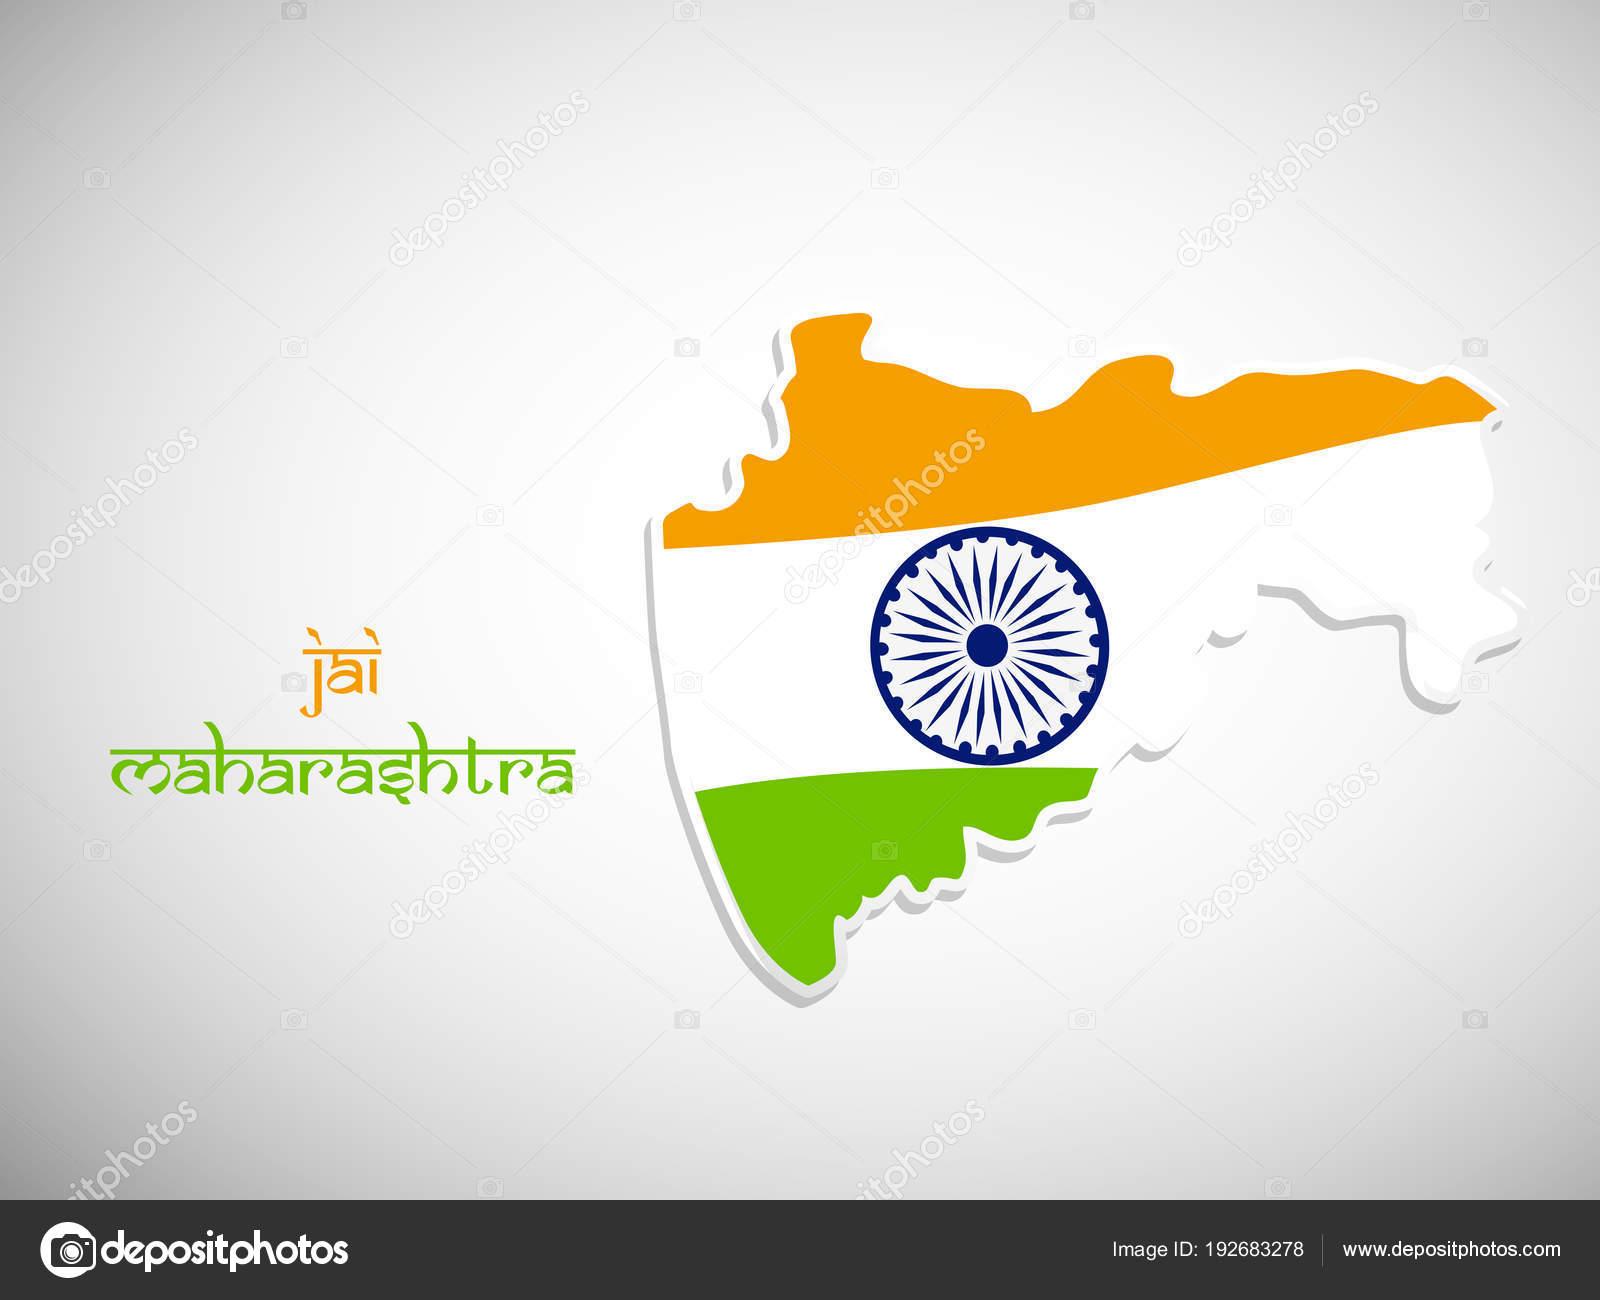 Illustration indian state maharashtra map hindi text jai maharashtra illustration indian state maharashtra map hindi text jai maharashtra meaning stock vector gumiabroncs Choice Image